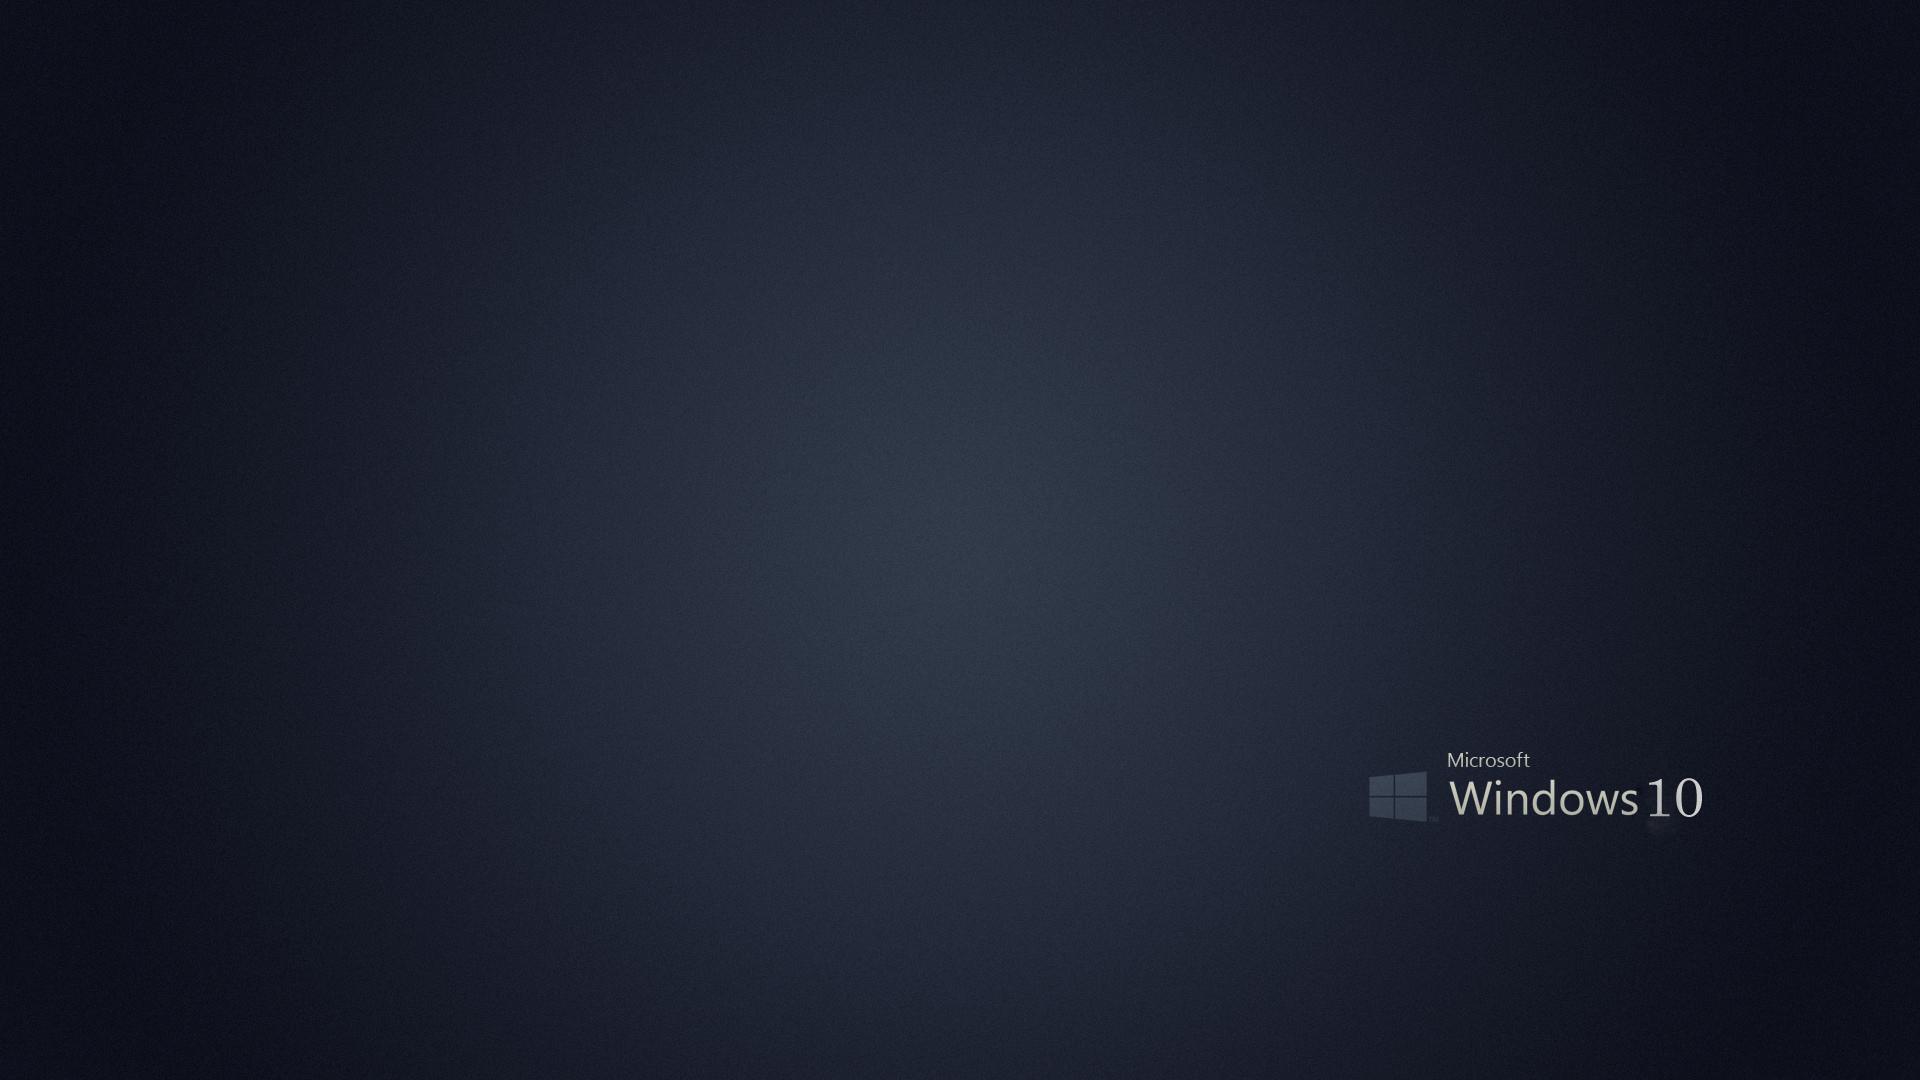 Hd wallpaper zip free download - Windows 10 Backgrounds And Wallpaper Wallpapersafari